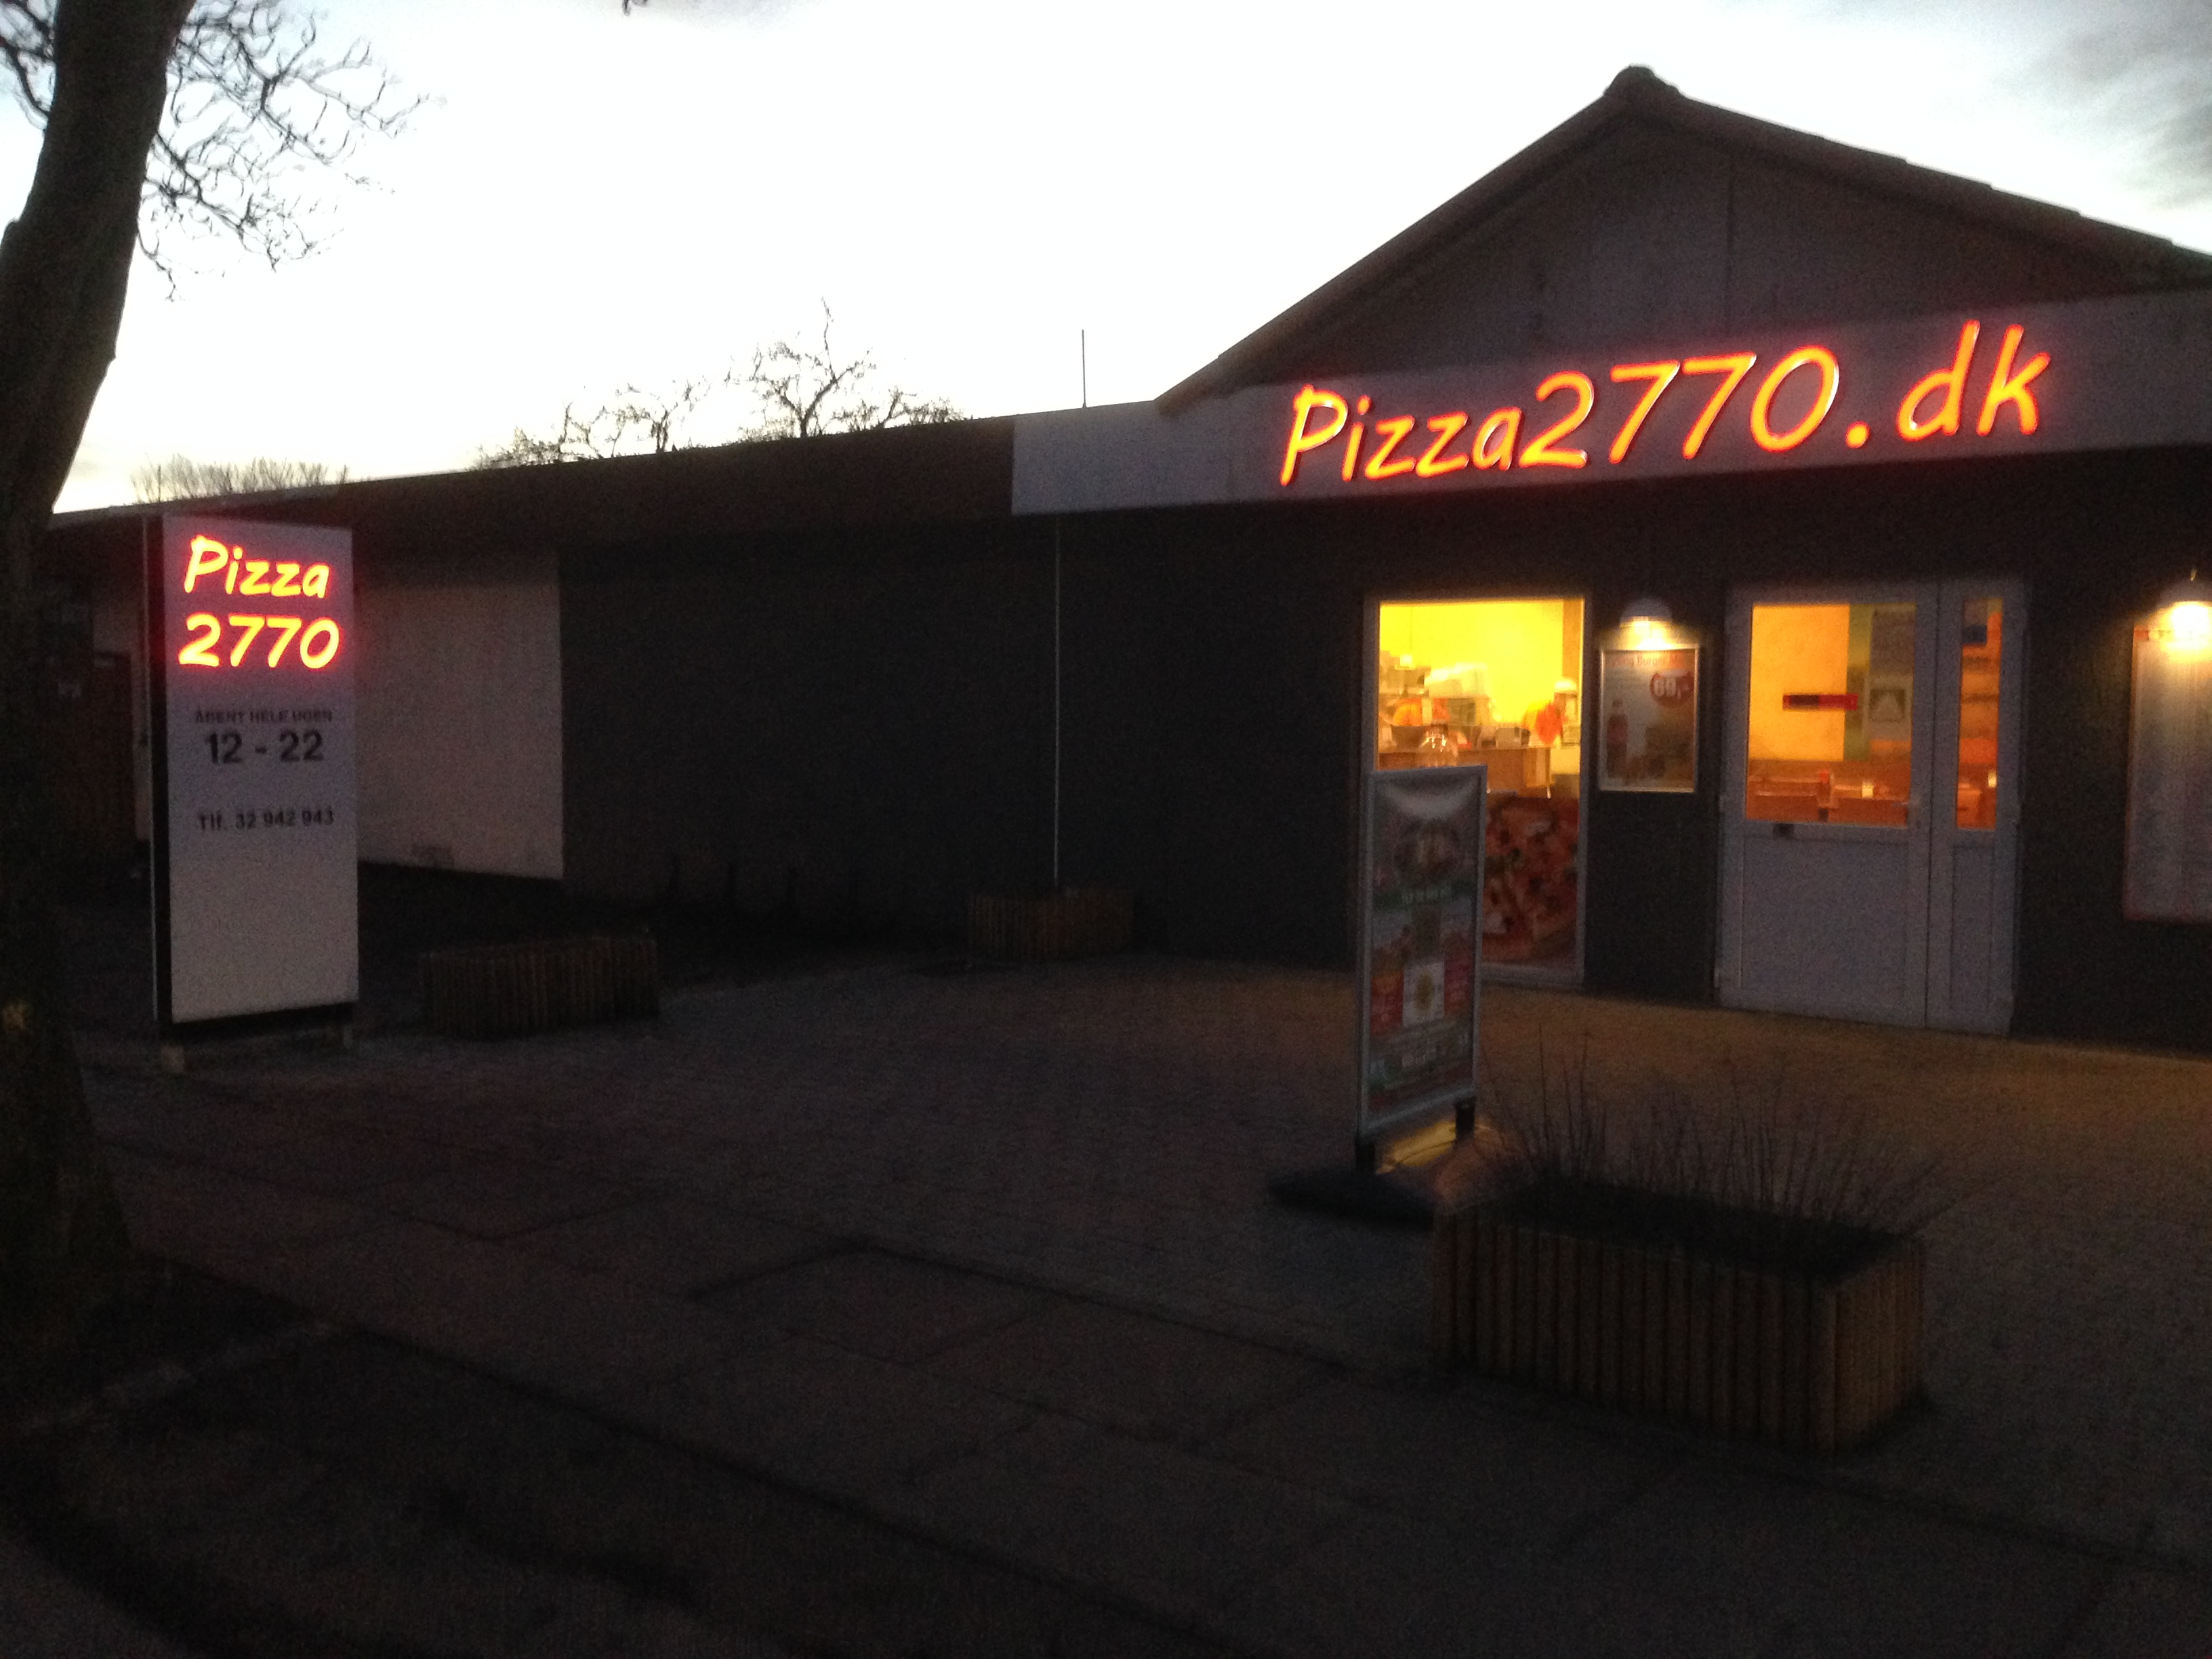 Pizza2770.dk